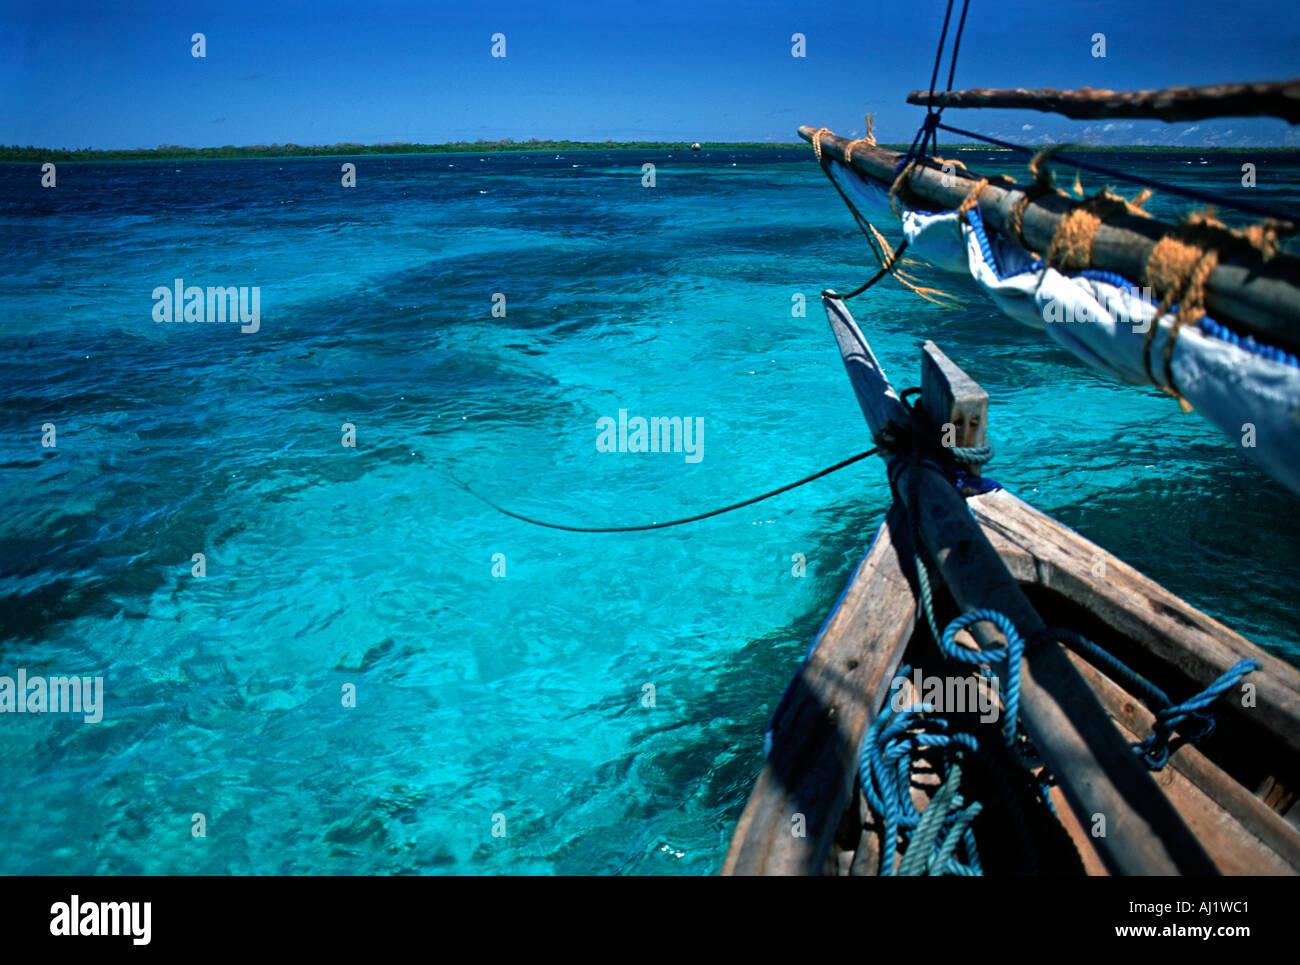 Crystal clear waters between Mafia Island and Chole island en route to the ruins of Kua on Joani island S of Zanzibar Tanzania - Stock Image